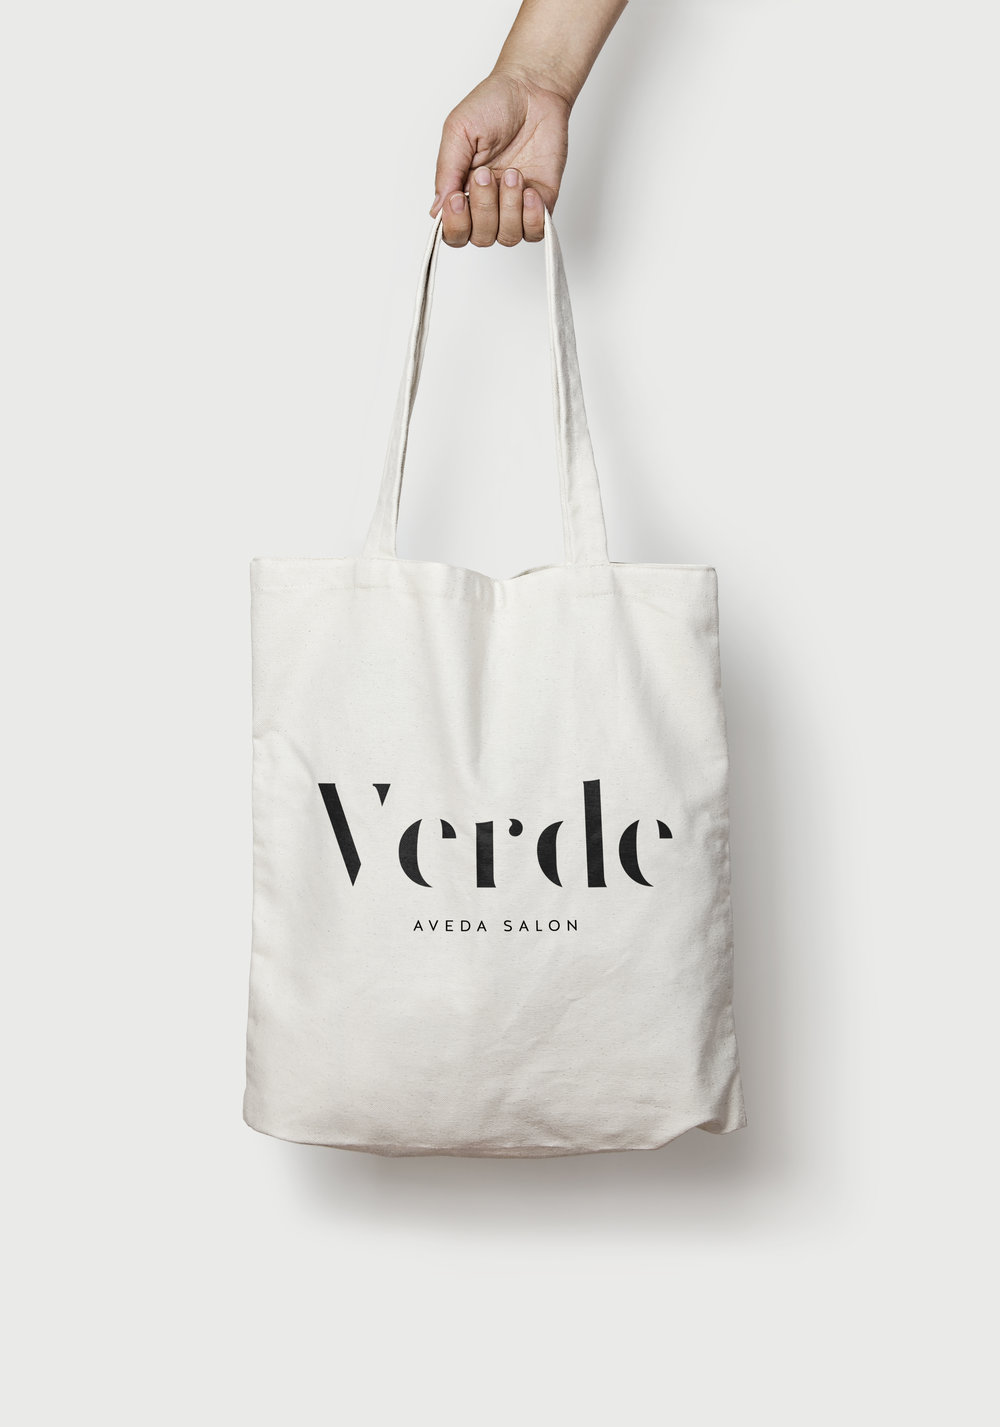 verde-aveda-salon-winnipeg-bridgwater-branding-design-clover-and-crow